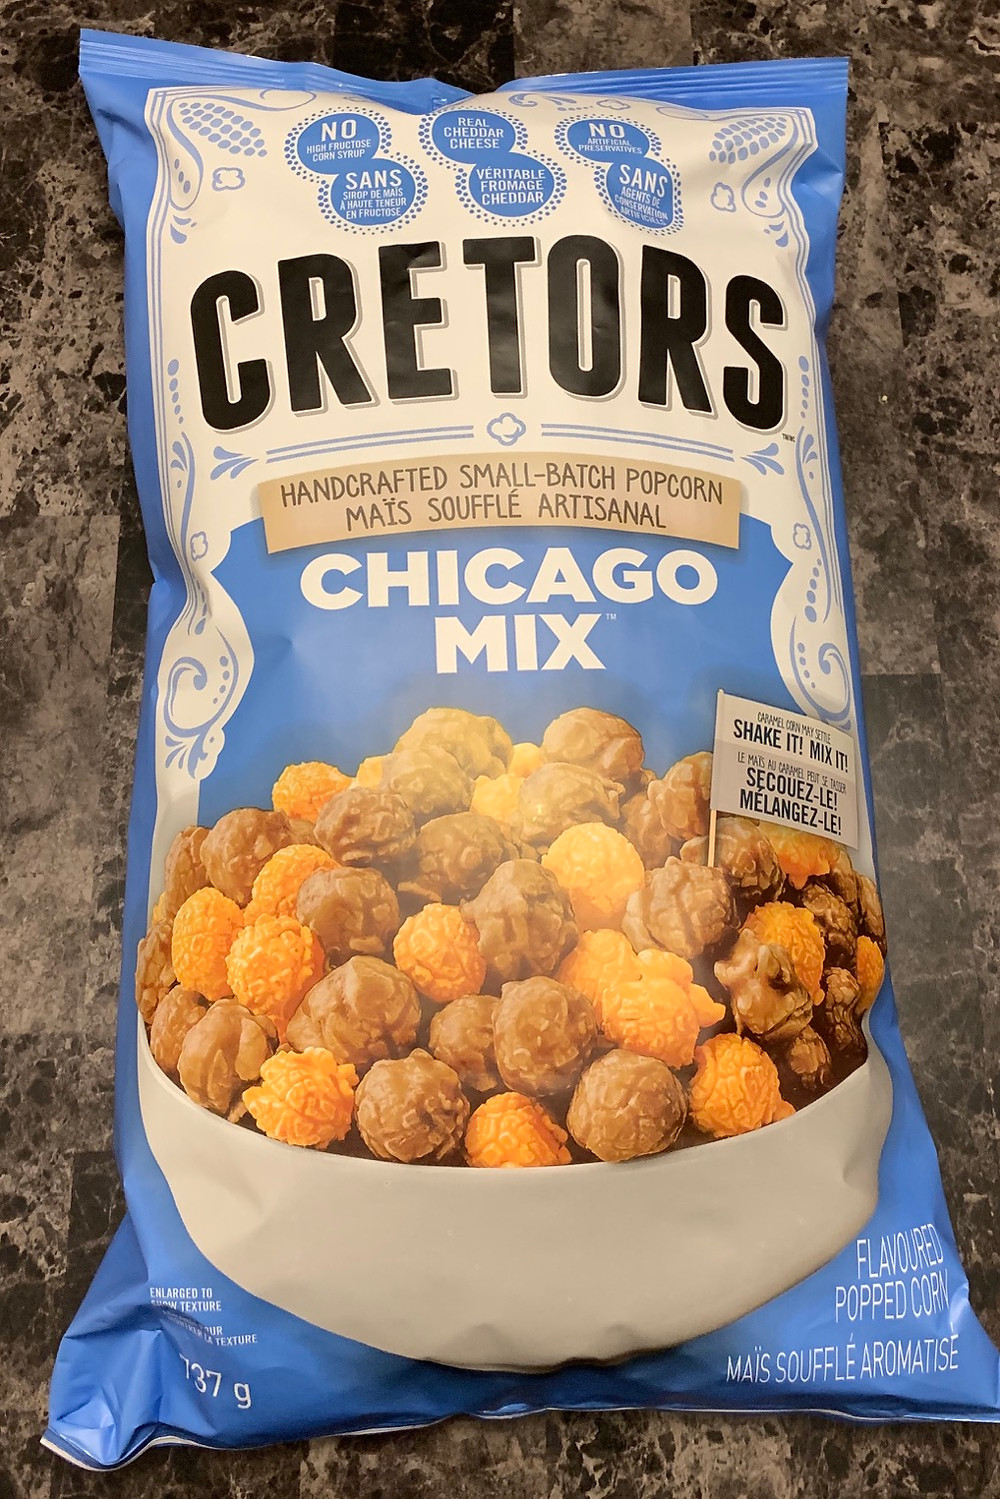 Costco Cretors Chicago Mix Popcorn